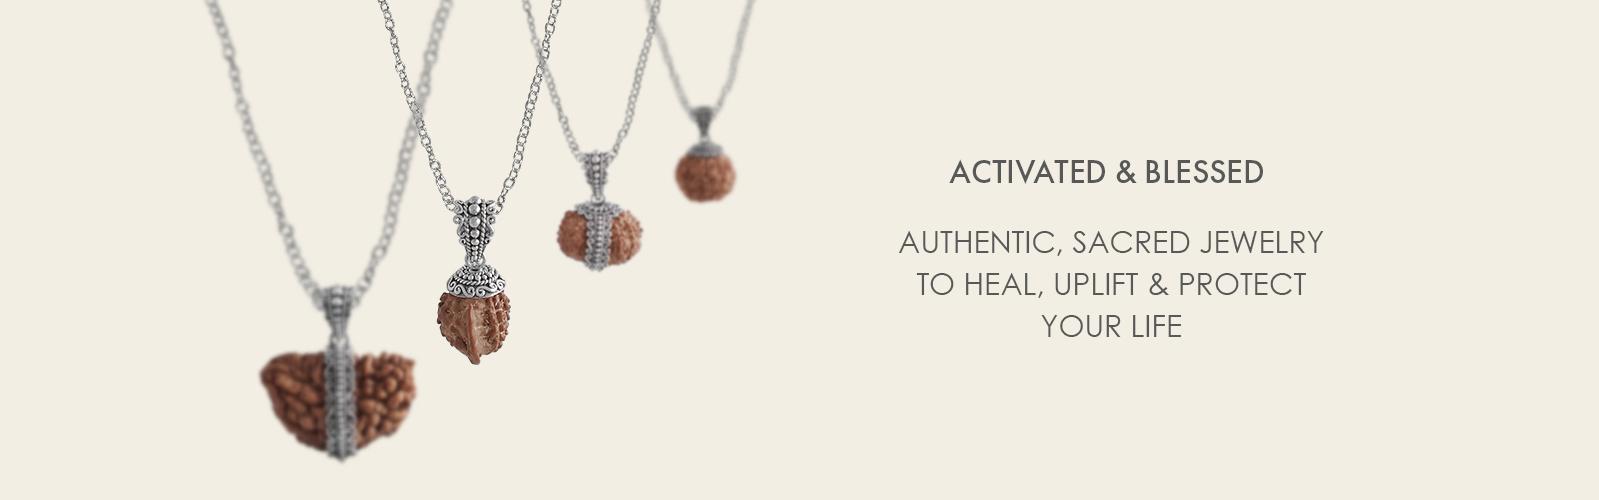 mukhis miracle beads spirituality - SHIVALOKA